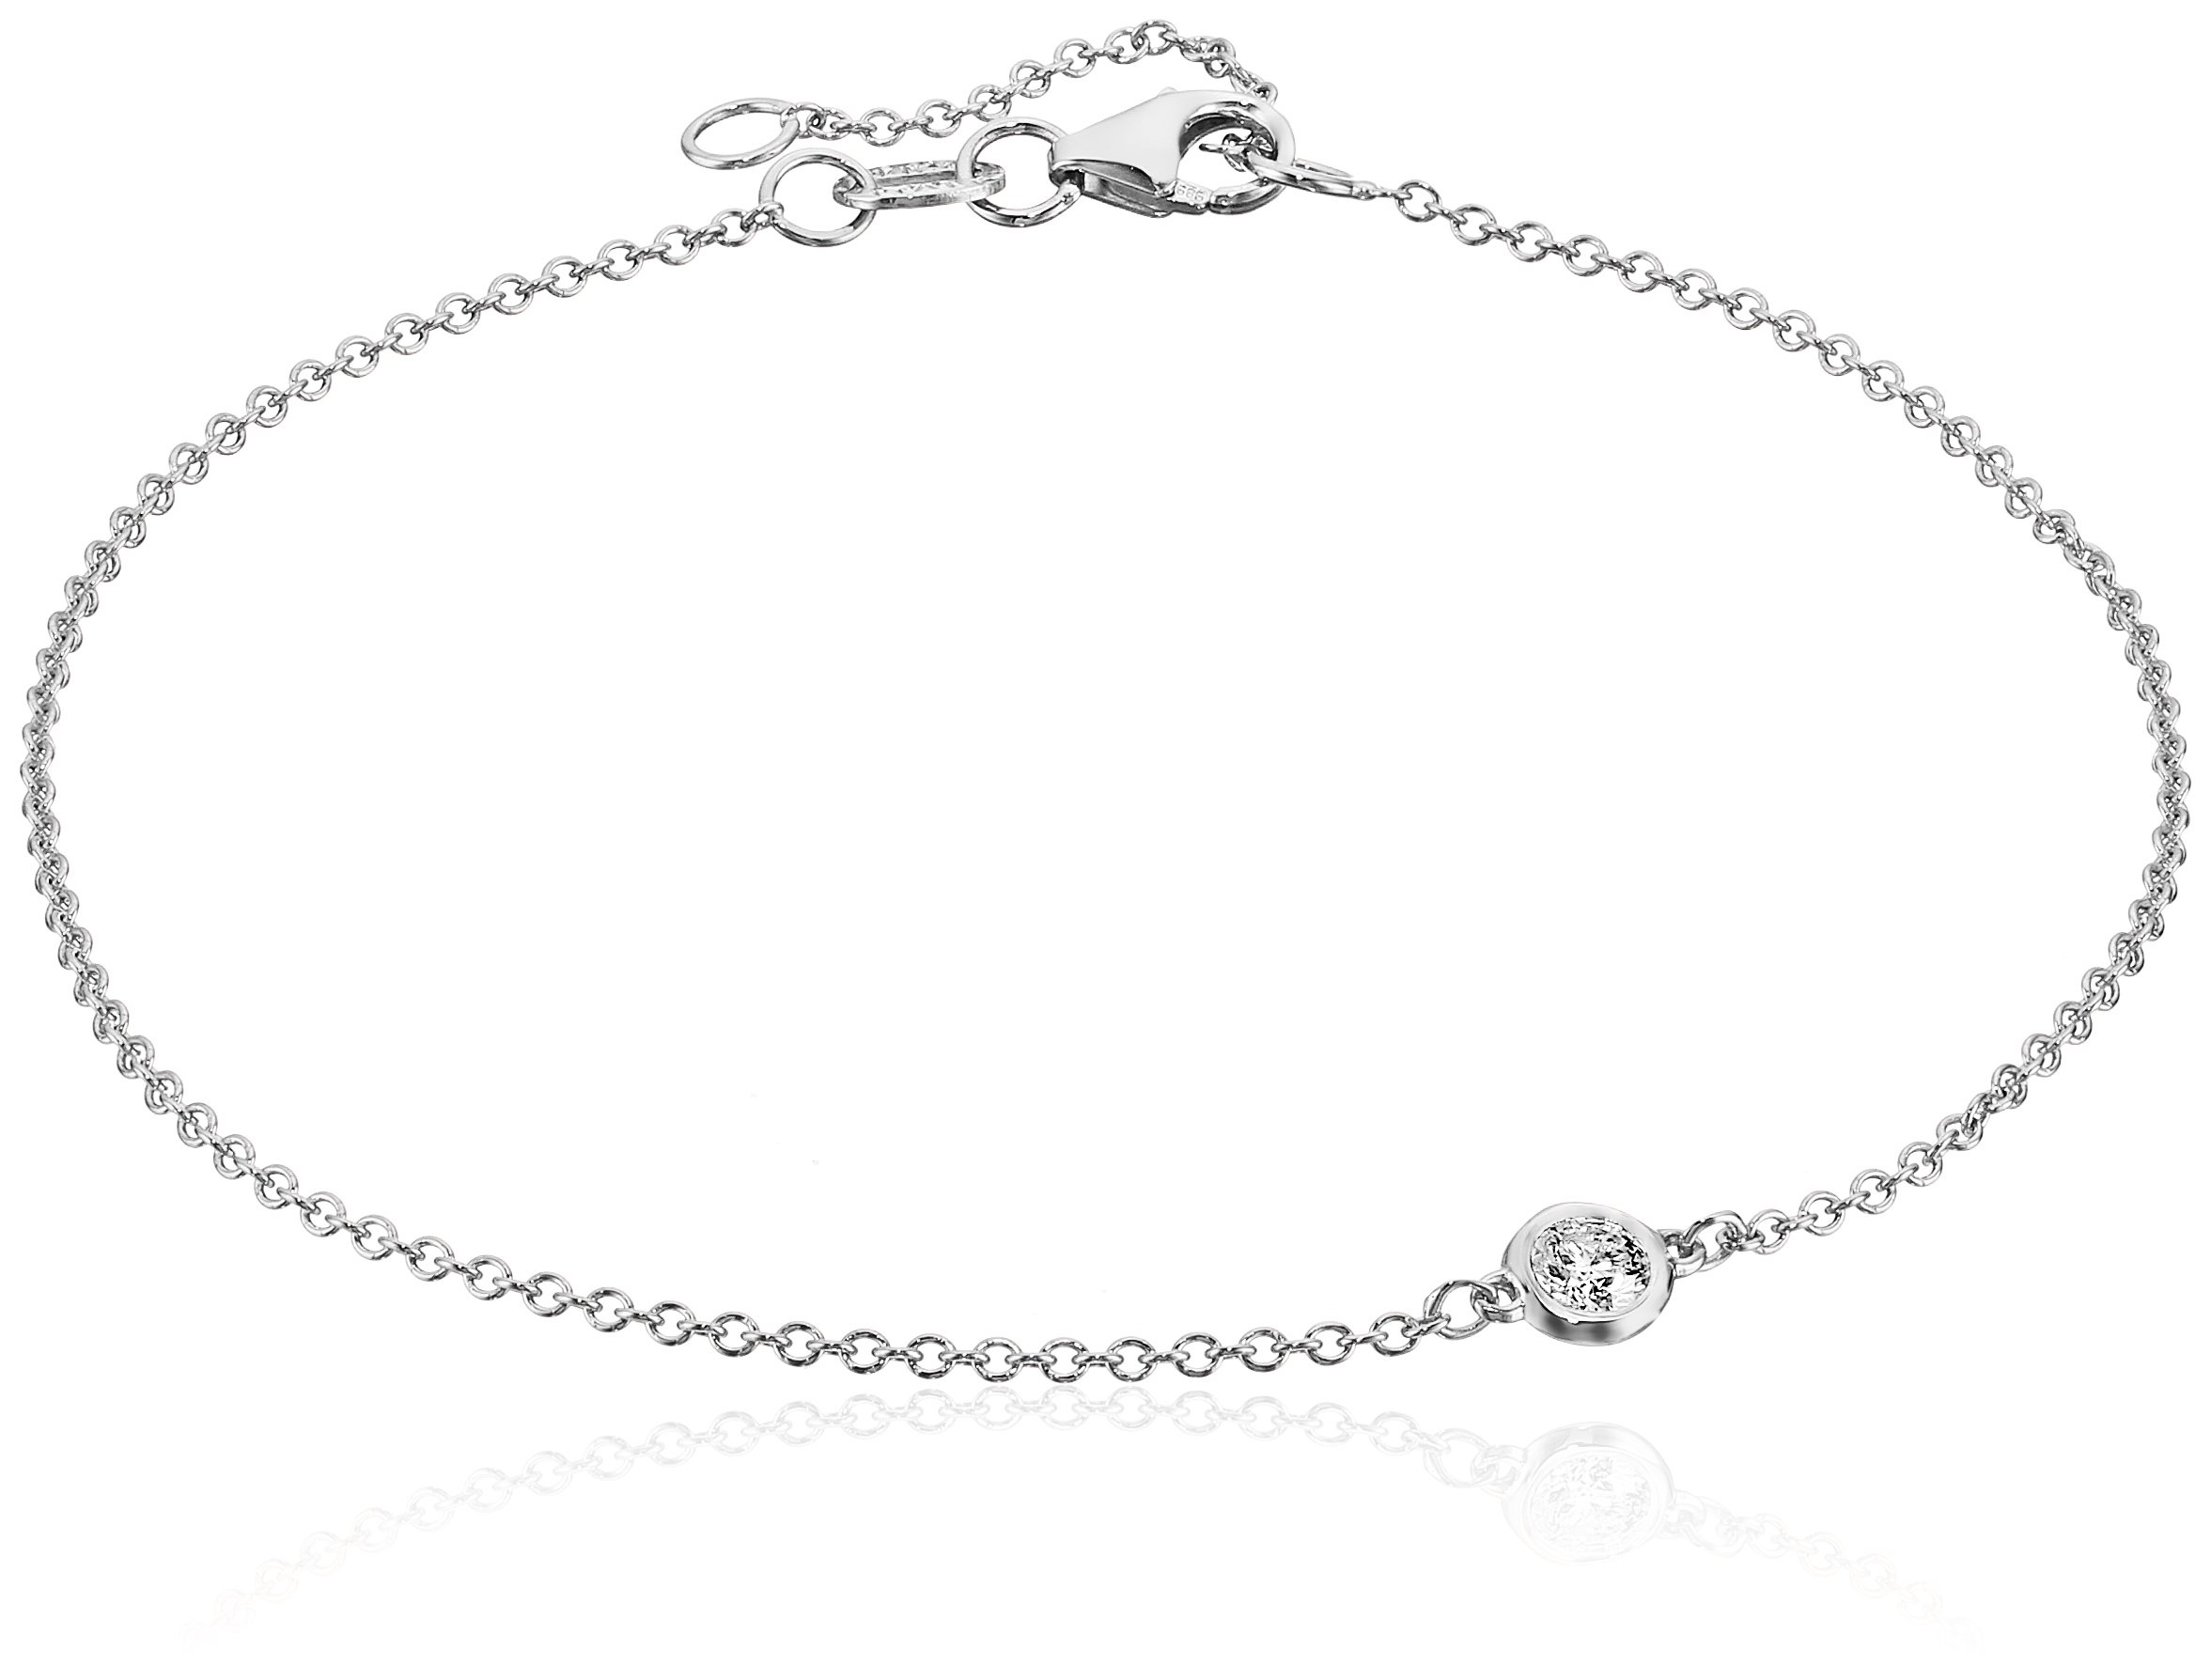 14k White Gold Solitaire Bezel Set Diamond with Lobster Clasp Strand Bracelet (1/10cttw, J-K Color, I2-I3 Clarity)